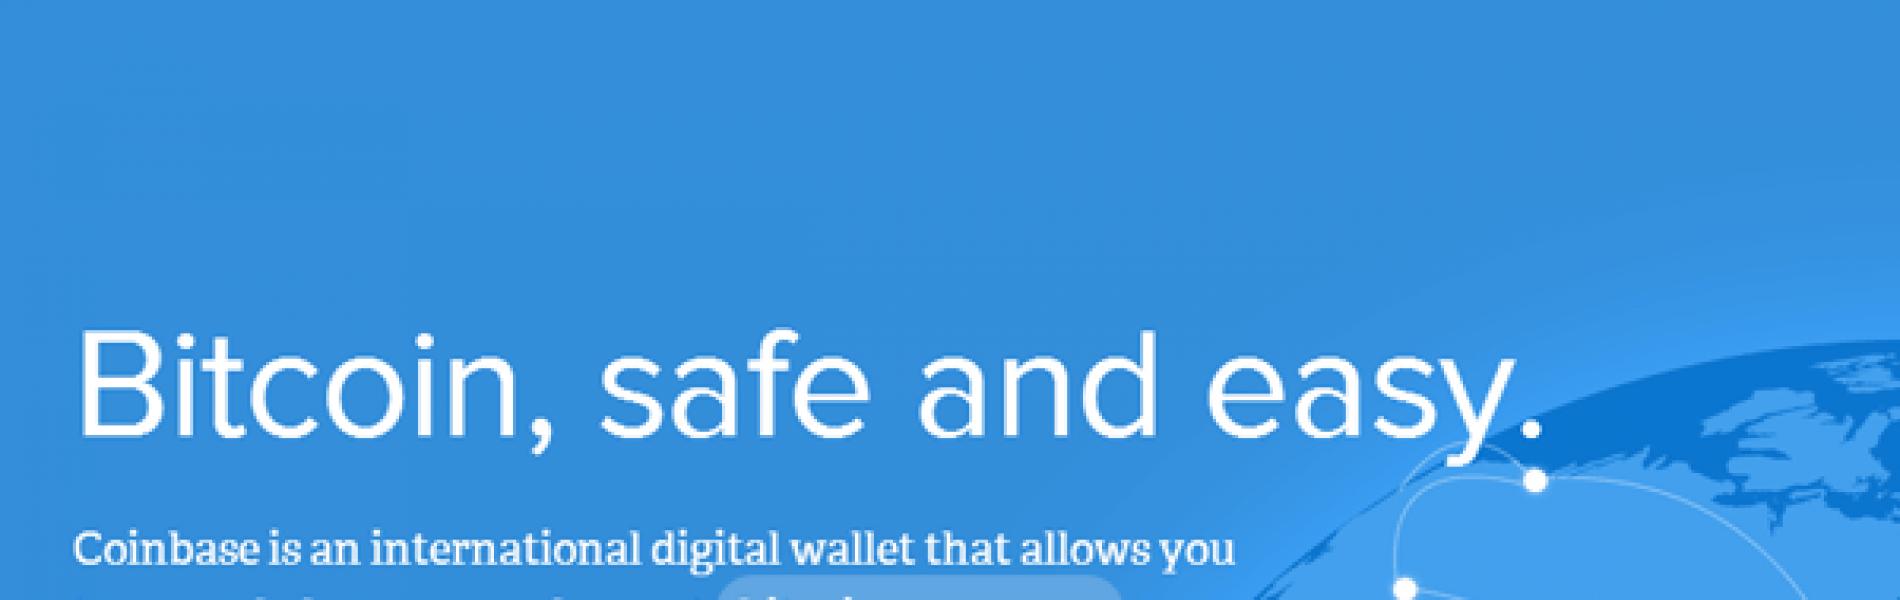 CoinBase.com appears to have ZERO customer service, beware!